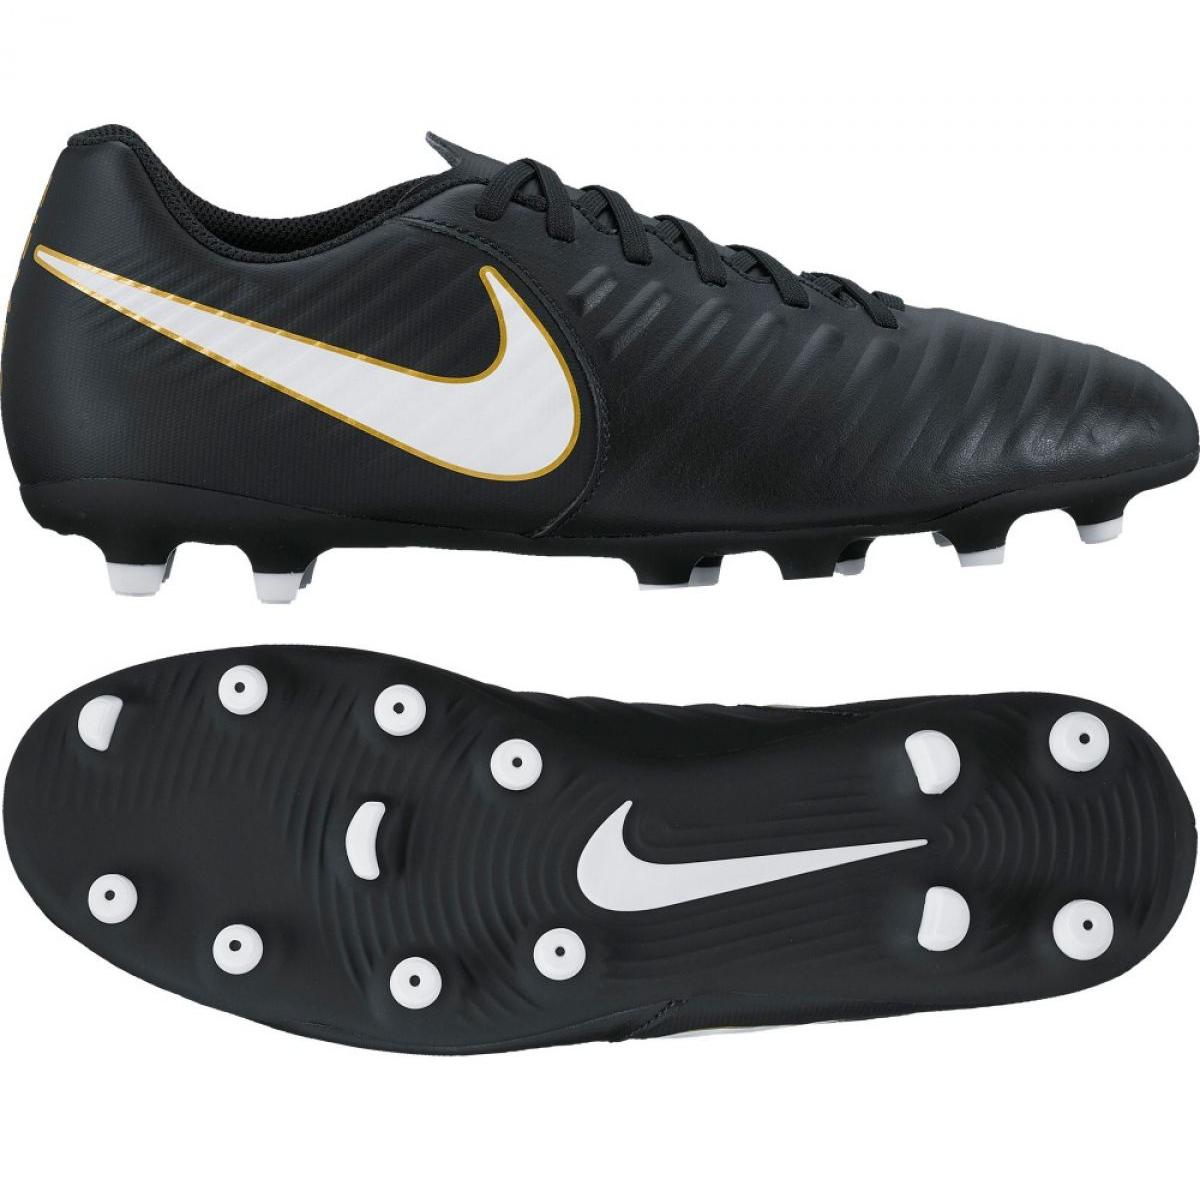 preferir llenar Giotto Dibondon  Football shoes Nike Tiempo Rio Iv Fg M 897759-002 black multicolored -  ButyModne.pl